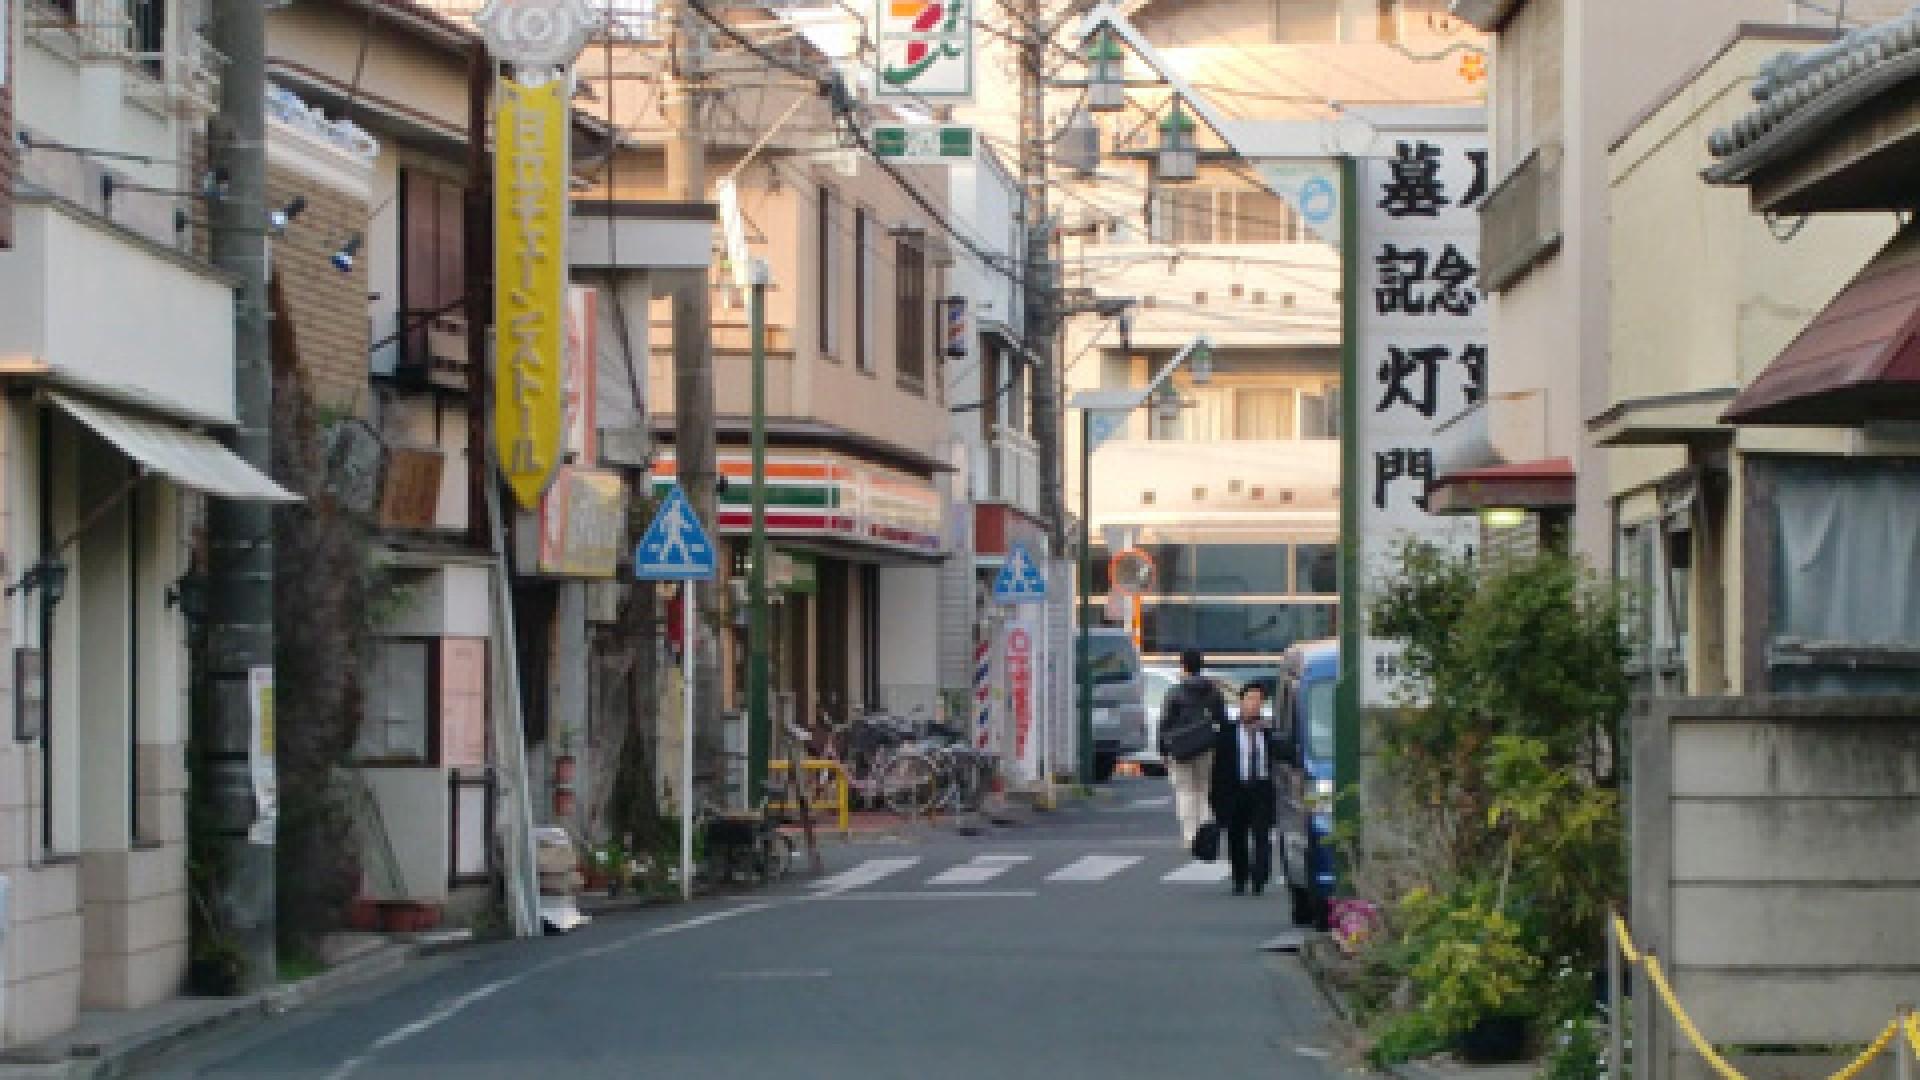 Honkugenuma Shoutengai (Honkugenuma Arkade) Hasuike-dori